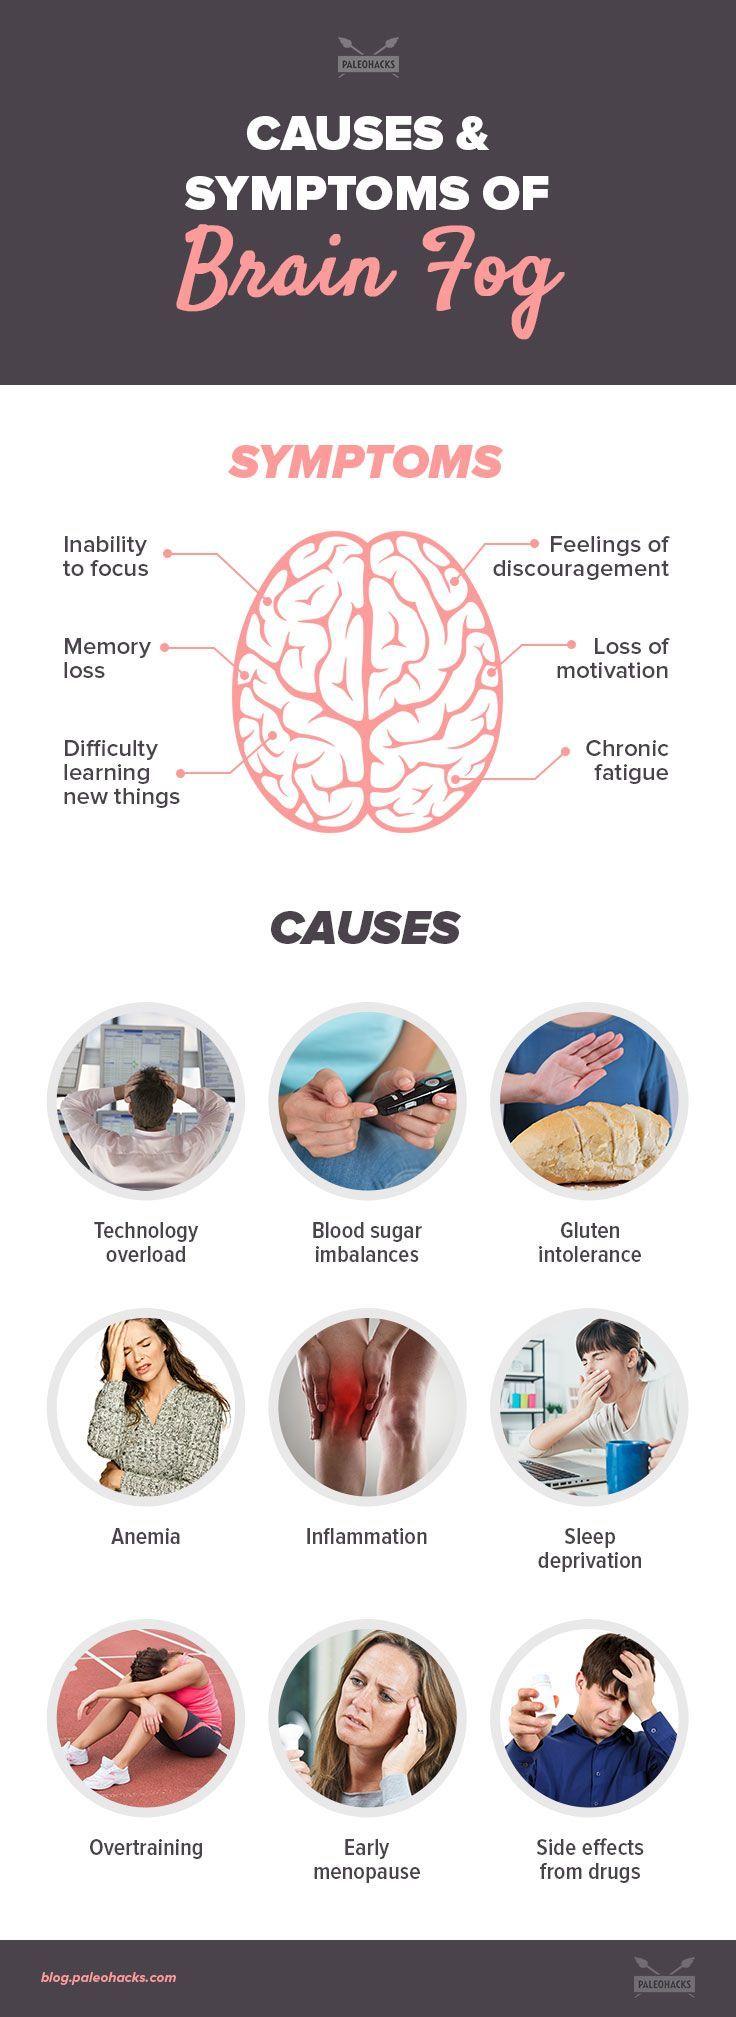 Causes-and-Symptoms-of-Brain-Fog-info.jpg